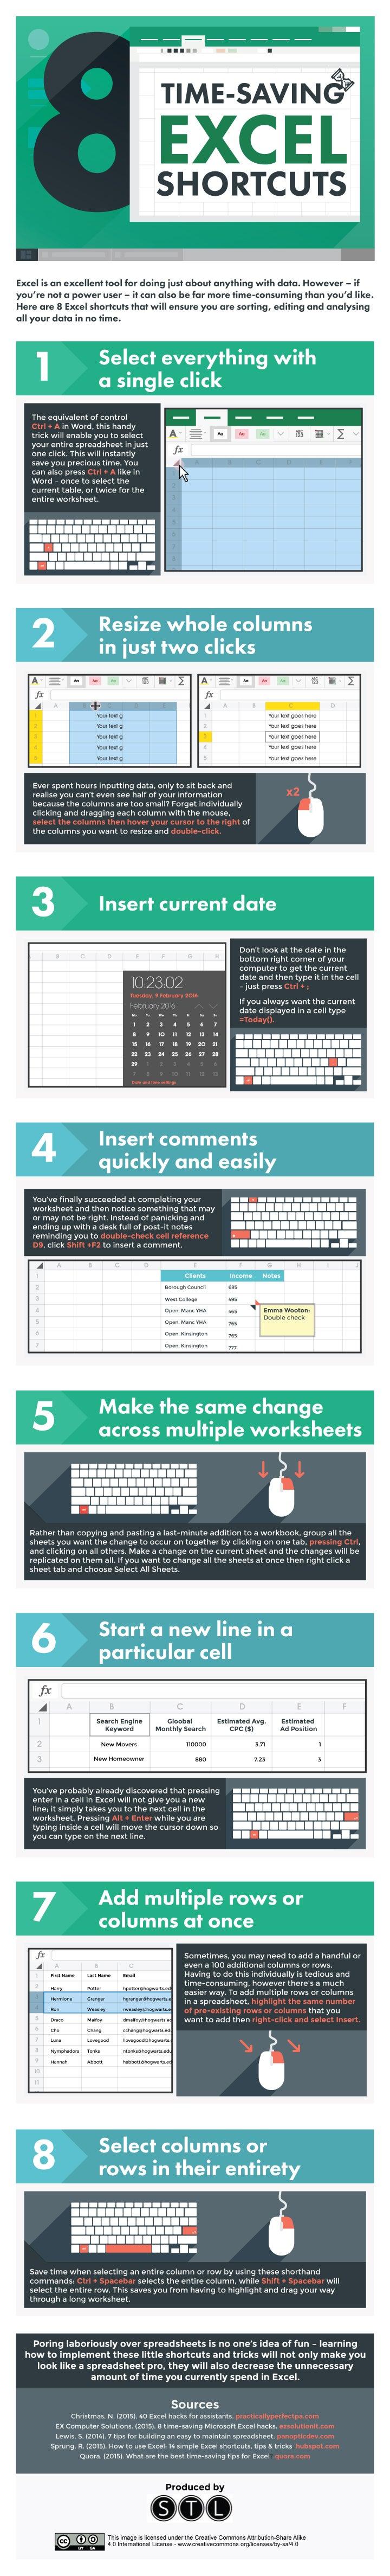 Eight Time-Saving Excel Shortcuts Worth Memorising